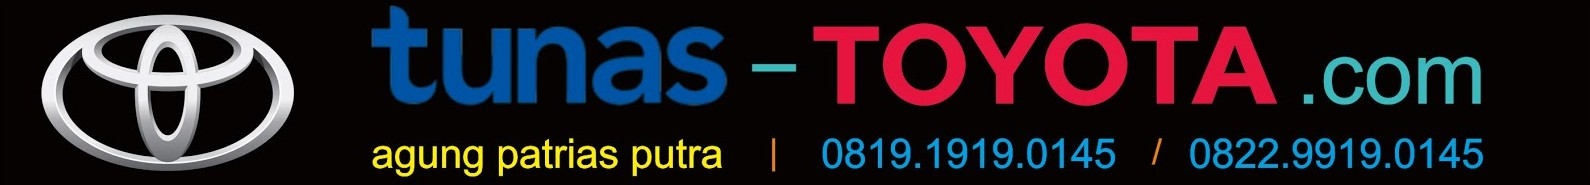 TUNAS TOYOTA TANGERANG |